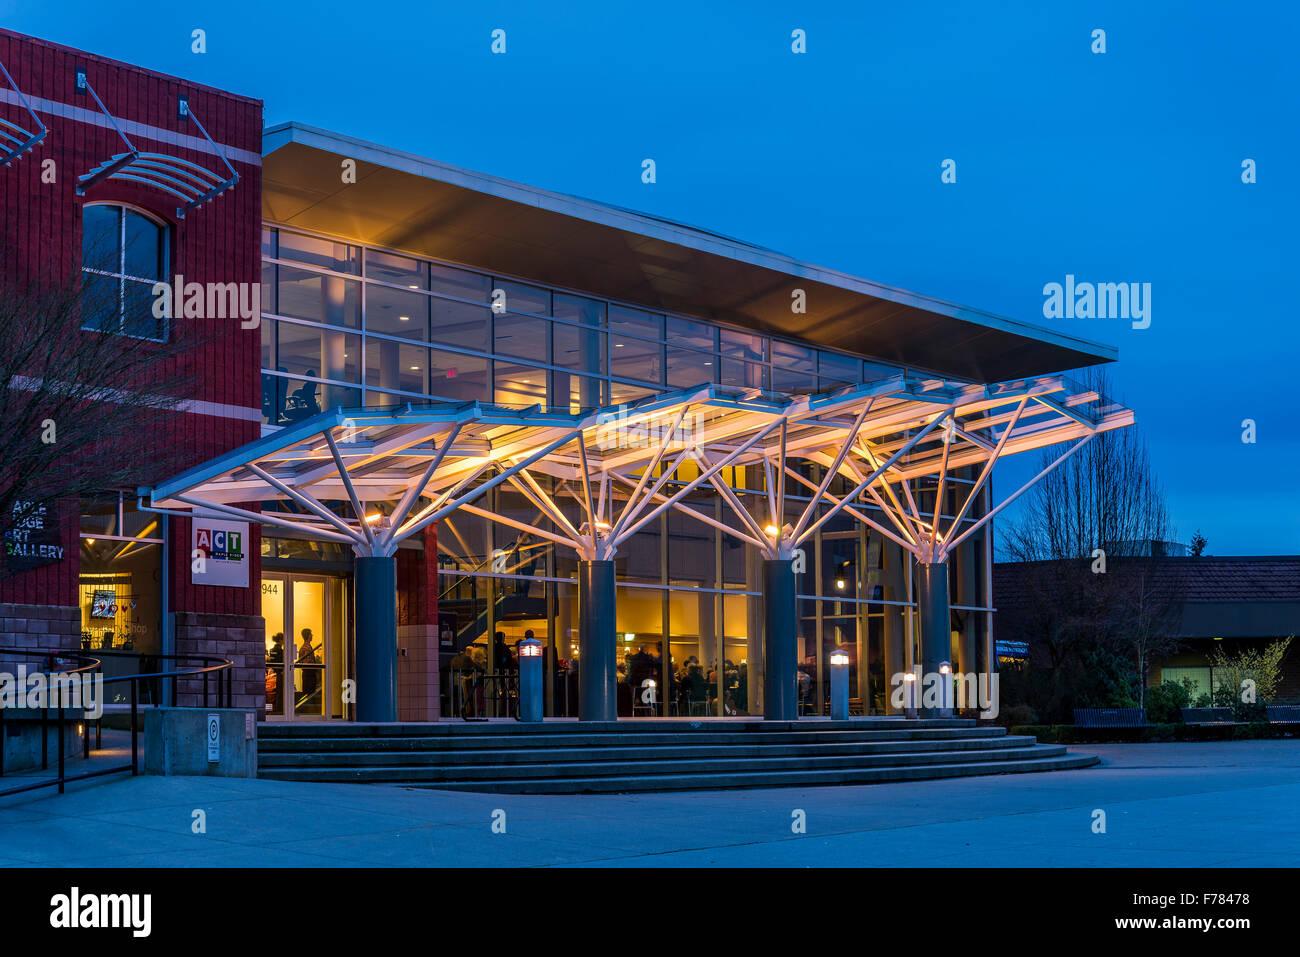 ACT, Arts Centre and Theatre Complex, District of Maple Ridge, British Columbia, Canada Stock Photo